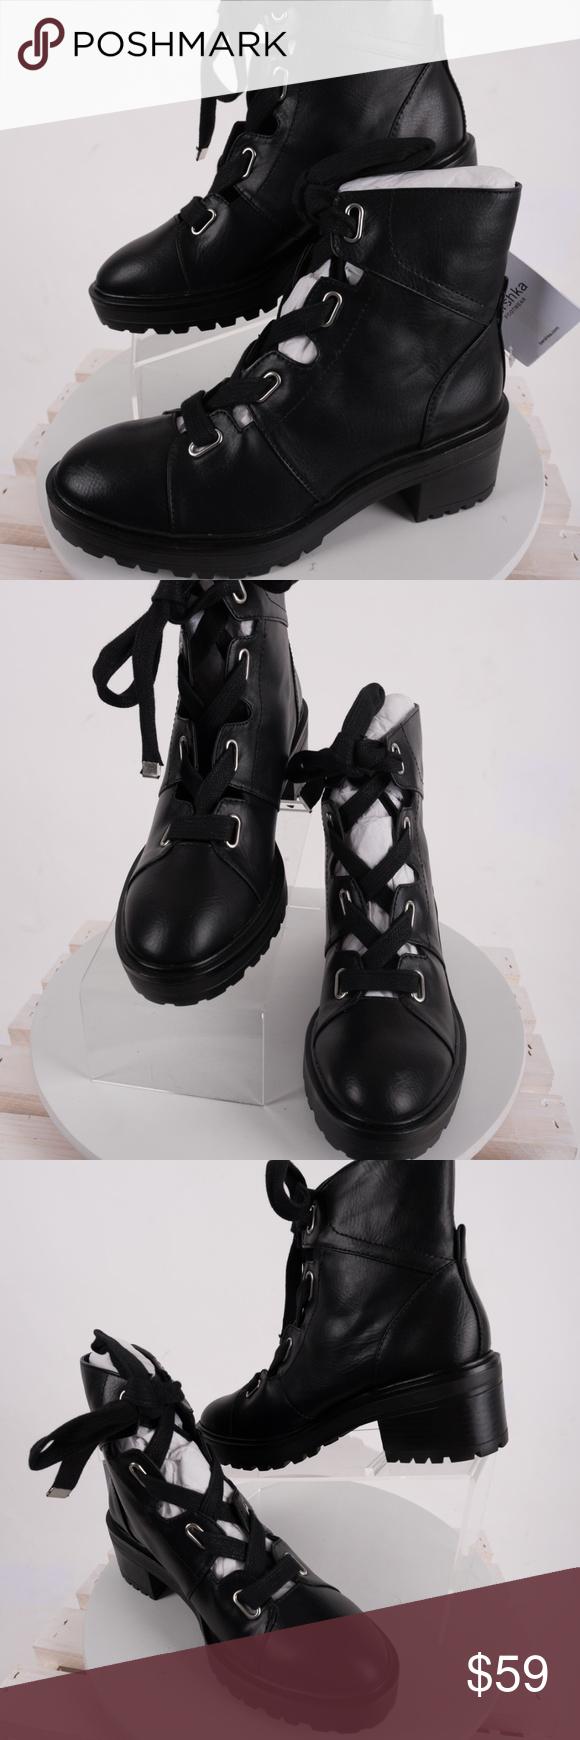 625abb5d3d7 Bershka Zara Combat Boots Lace Up Openwork eyelet Bershka Zara ...